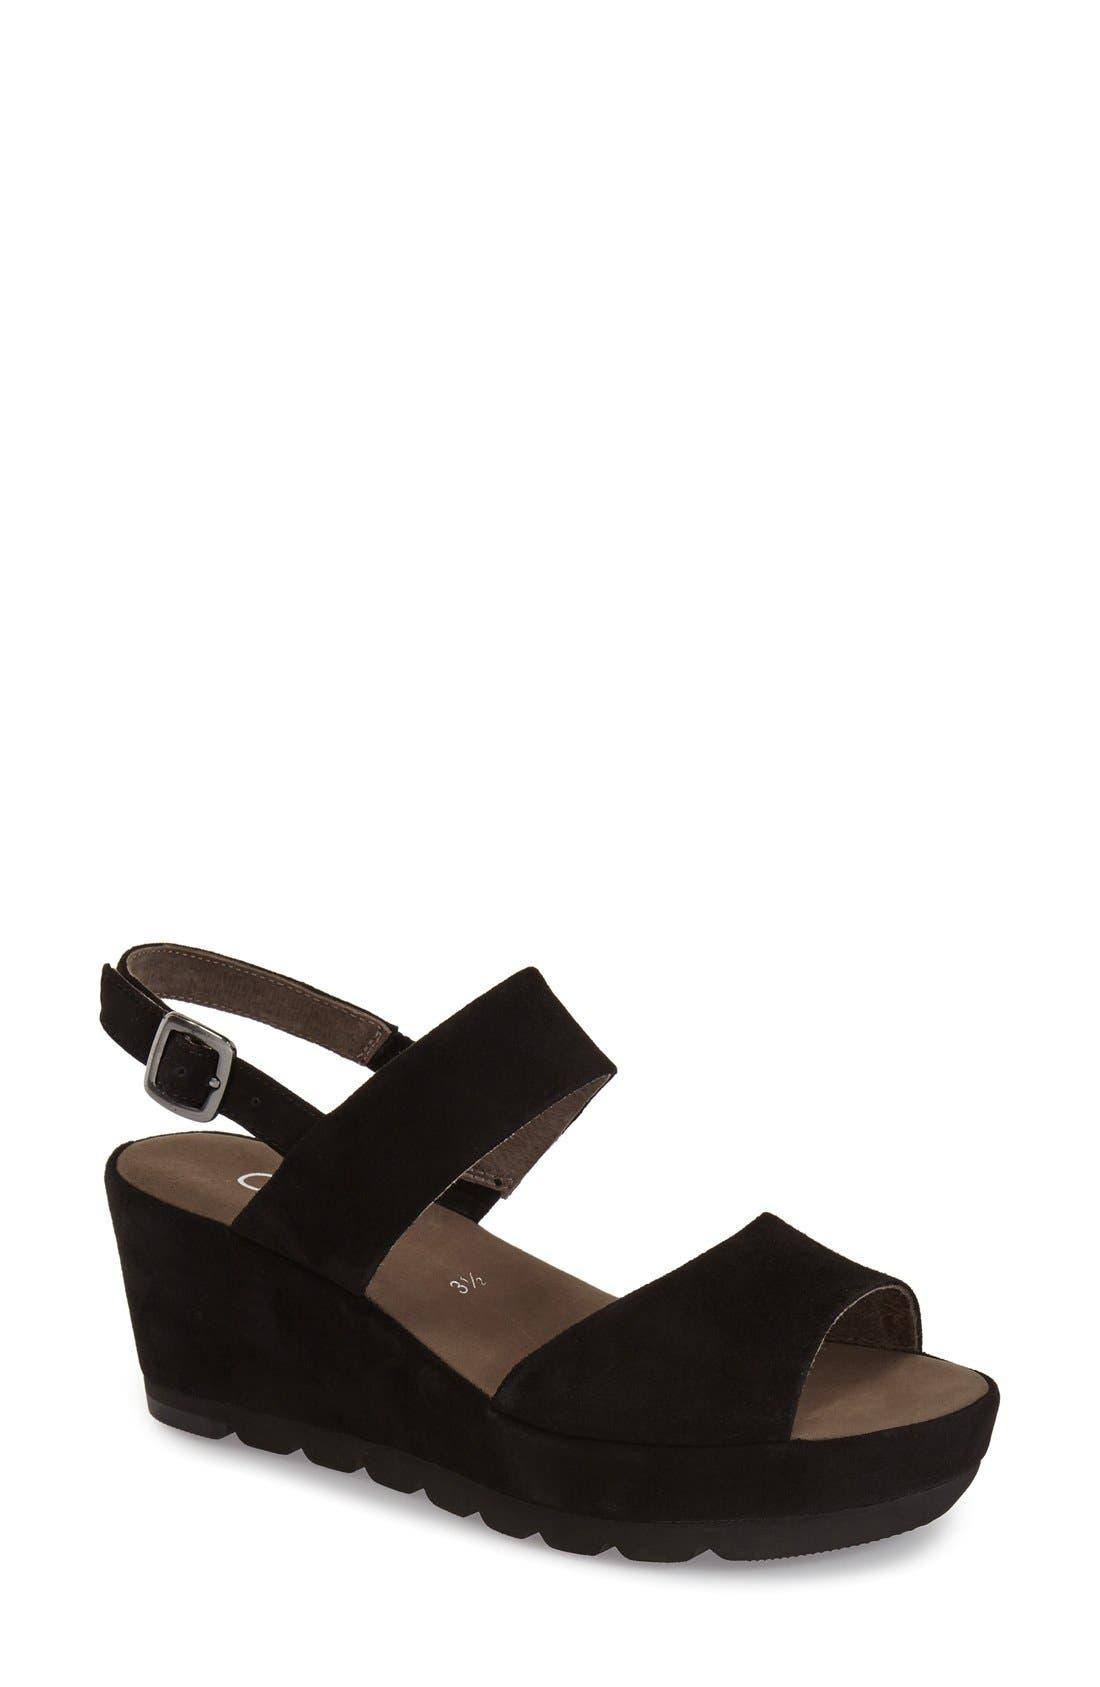 Two-Strap Sandal,                         Main,                         color,